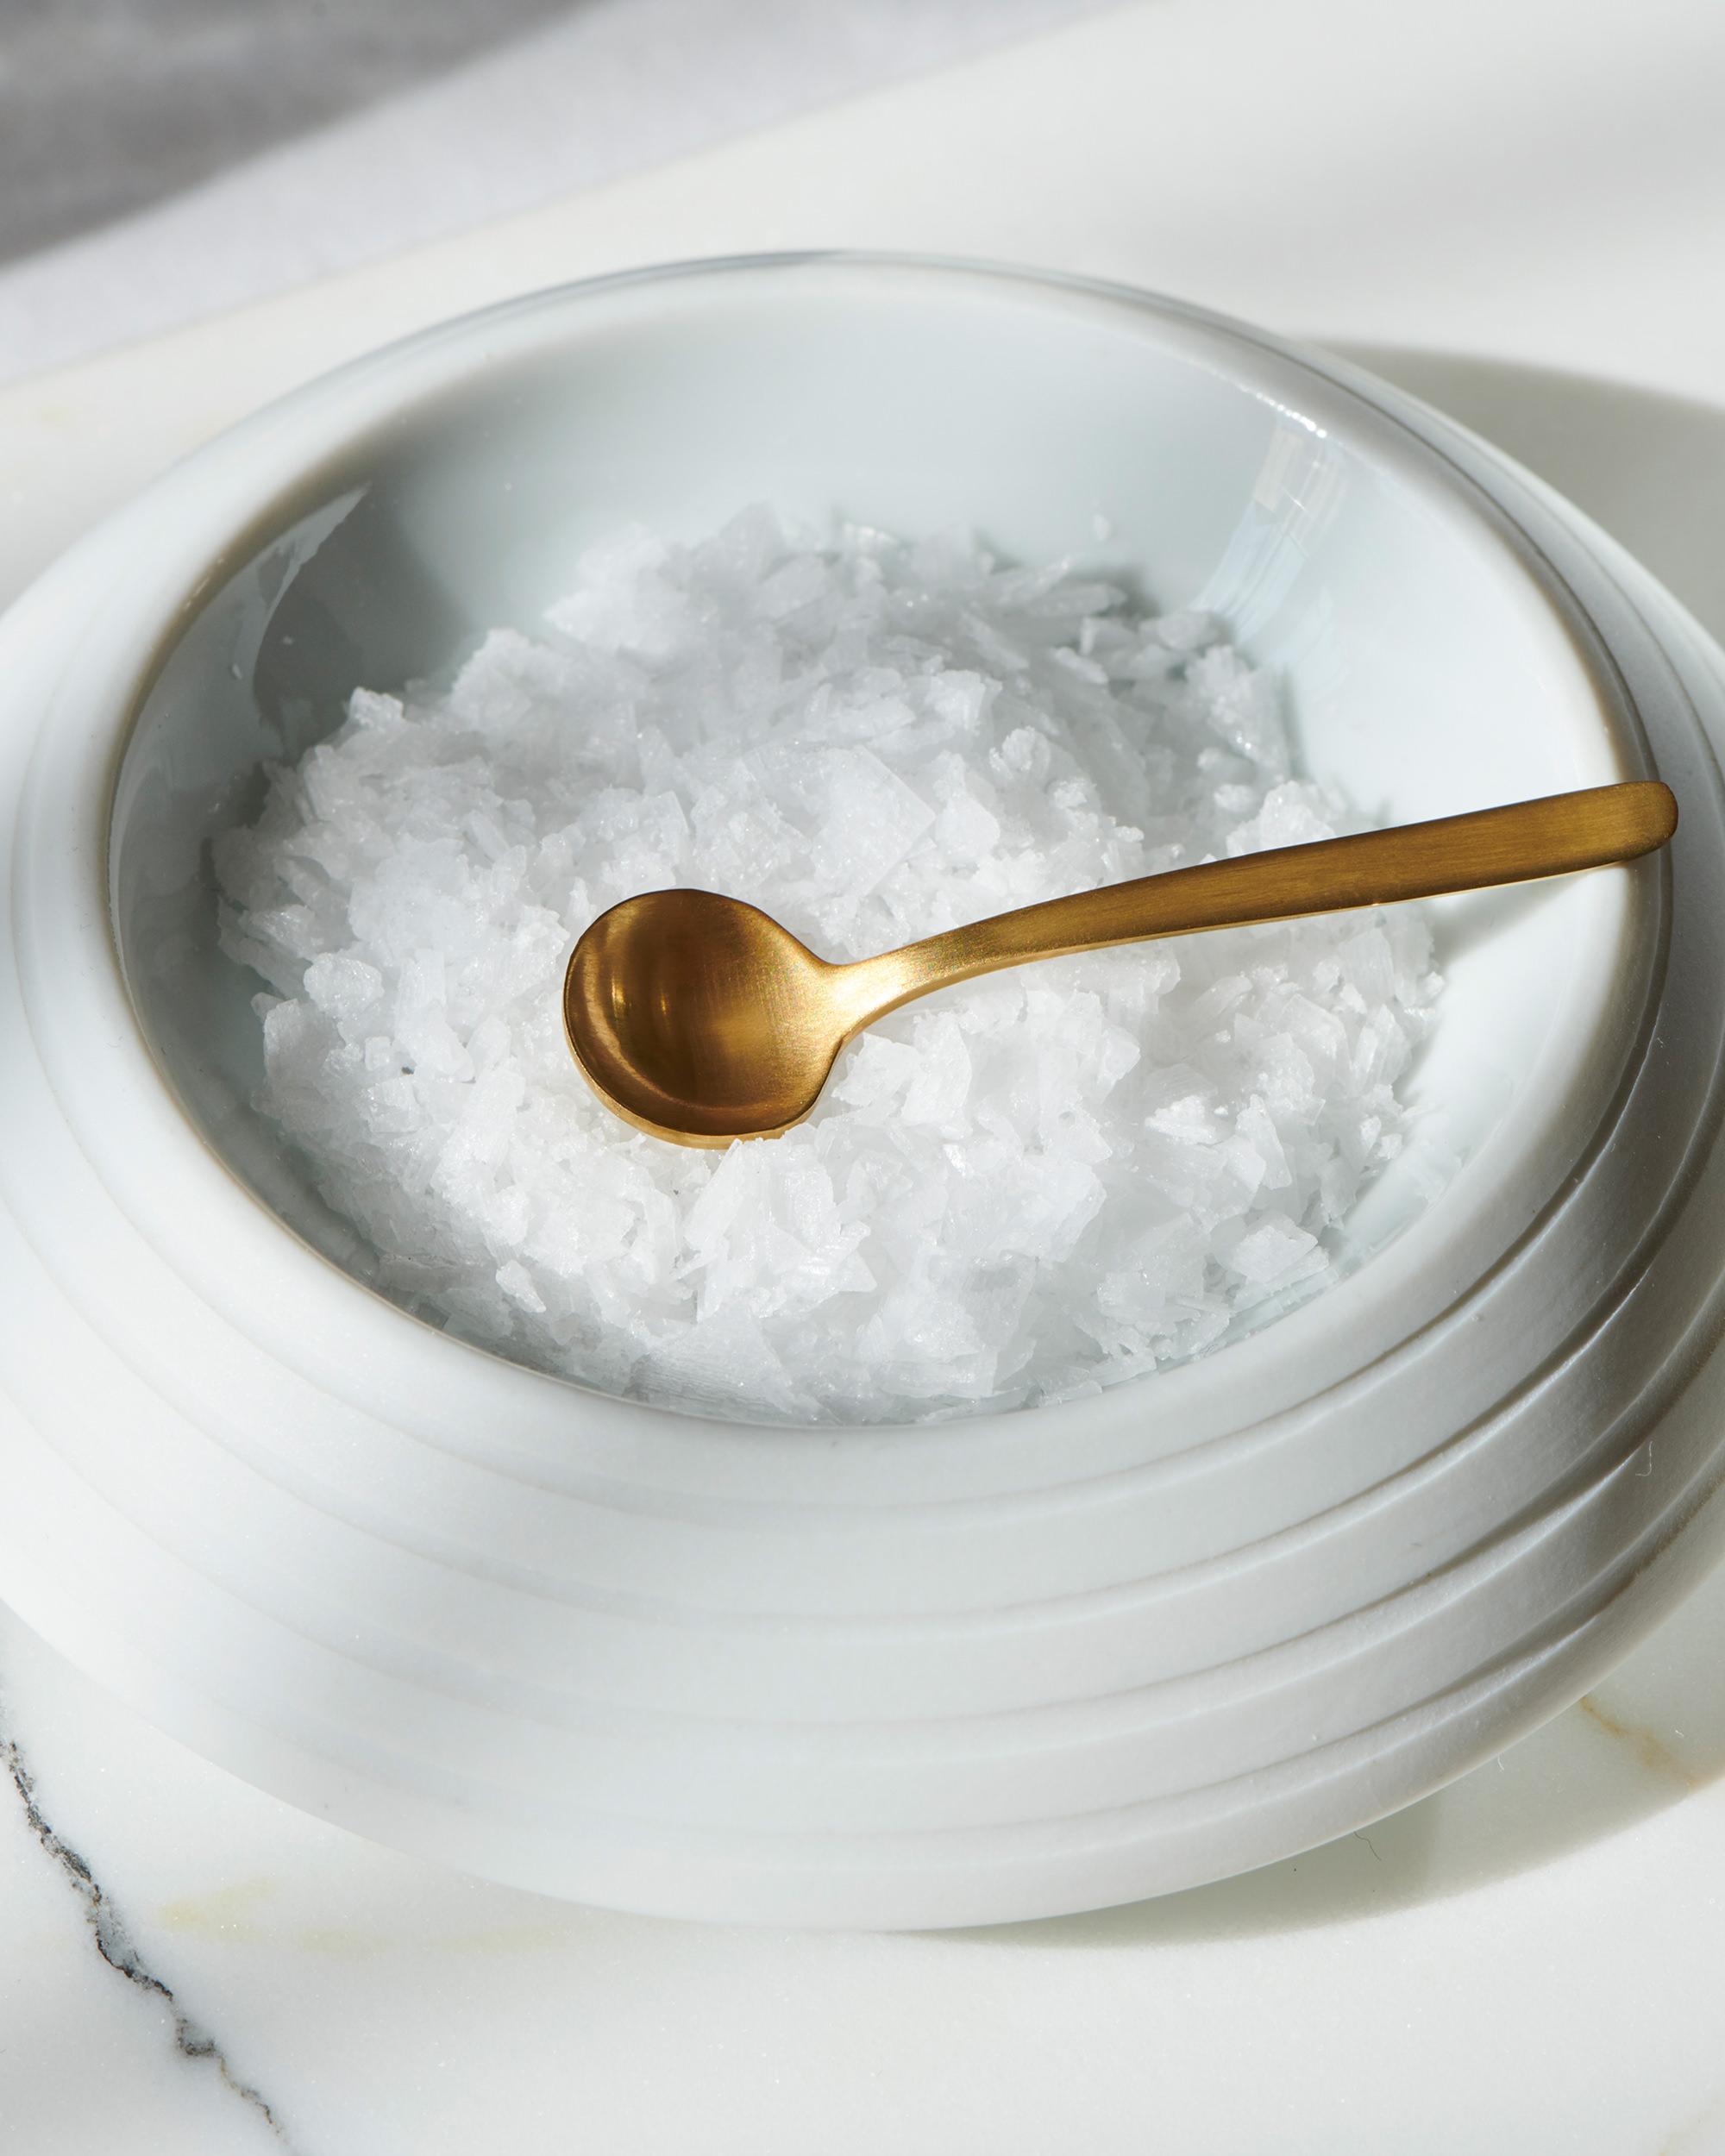 Hering x Pott Kollaboration Bundle 01 Salz 03 Credits Fabian Frinzel